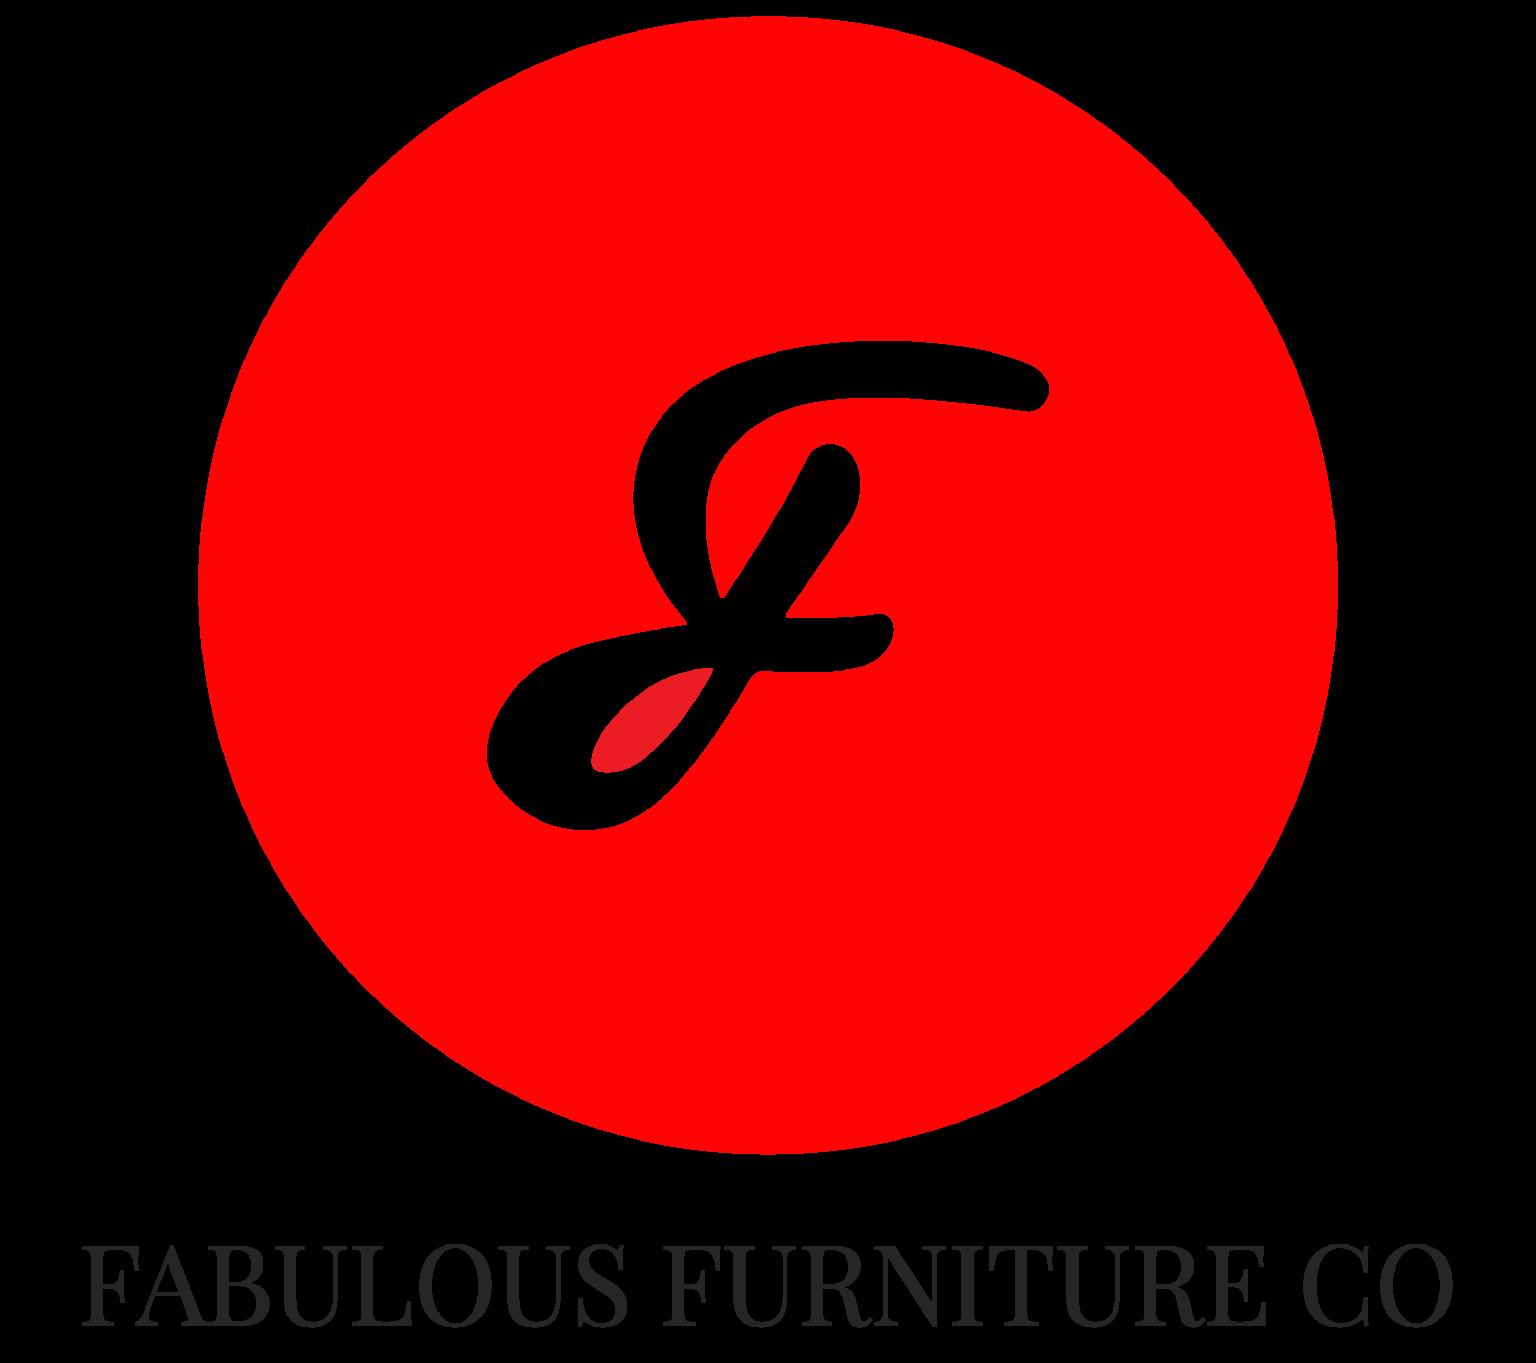 Fabulous Furniture Company Ltd